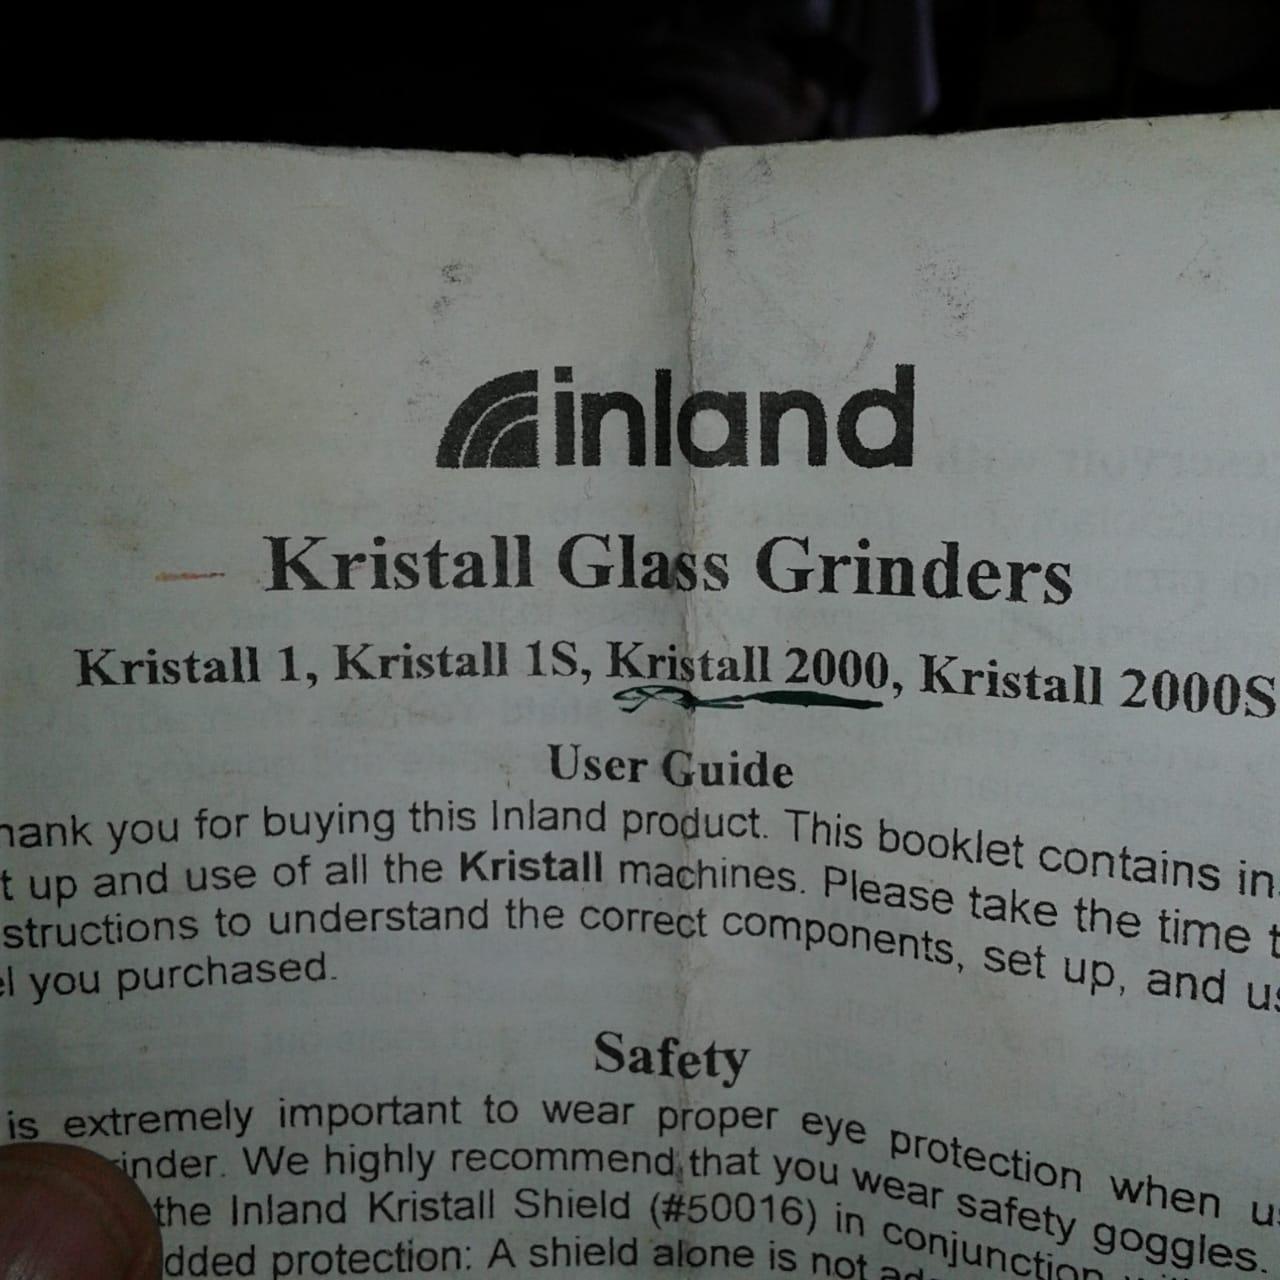 Kristall glass grinder